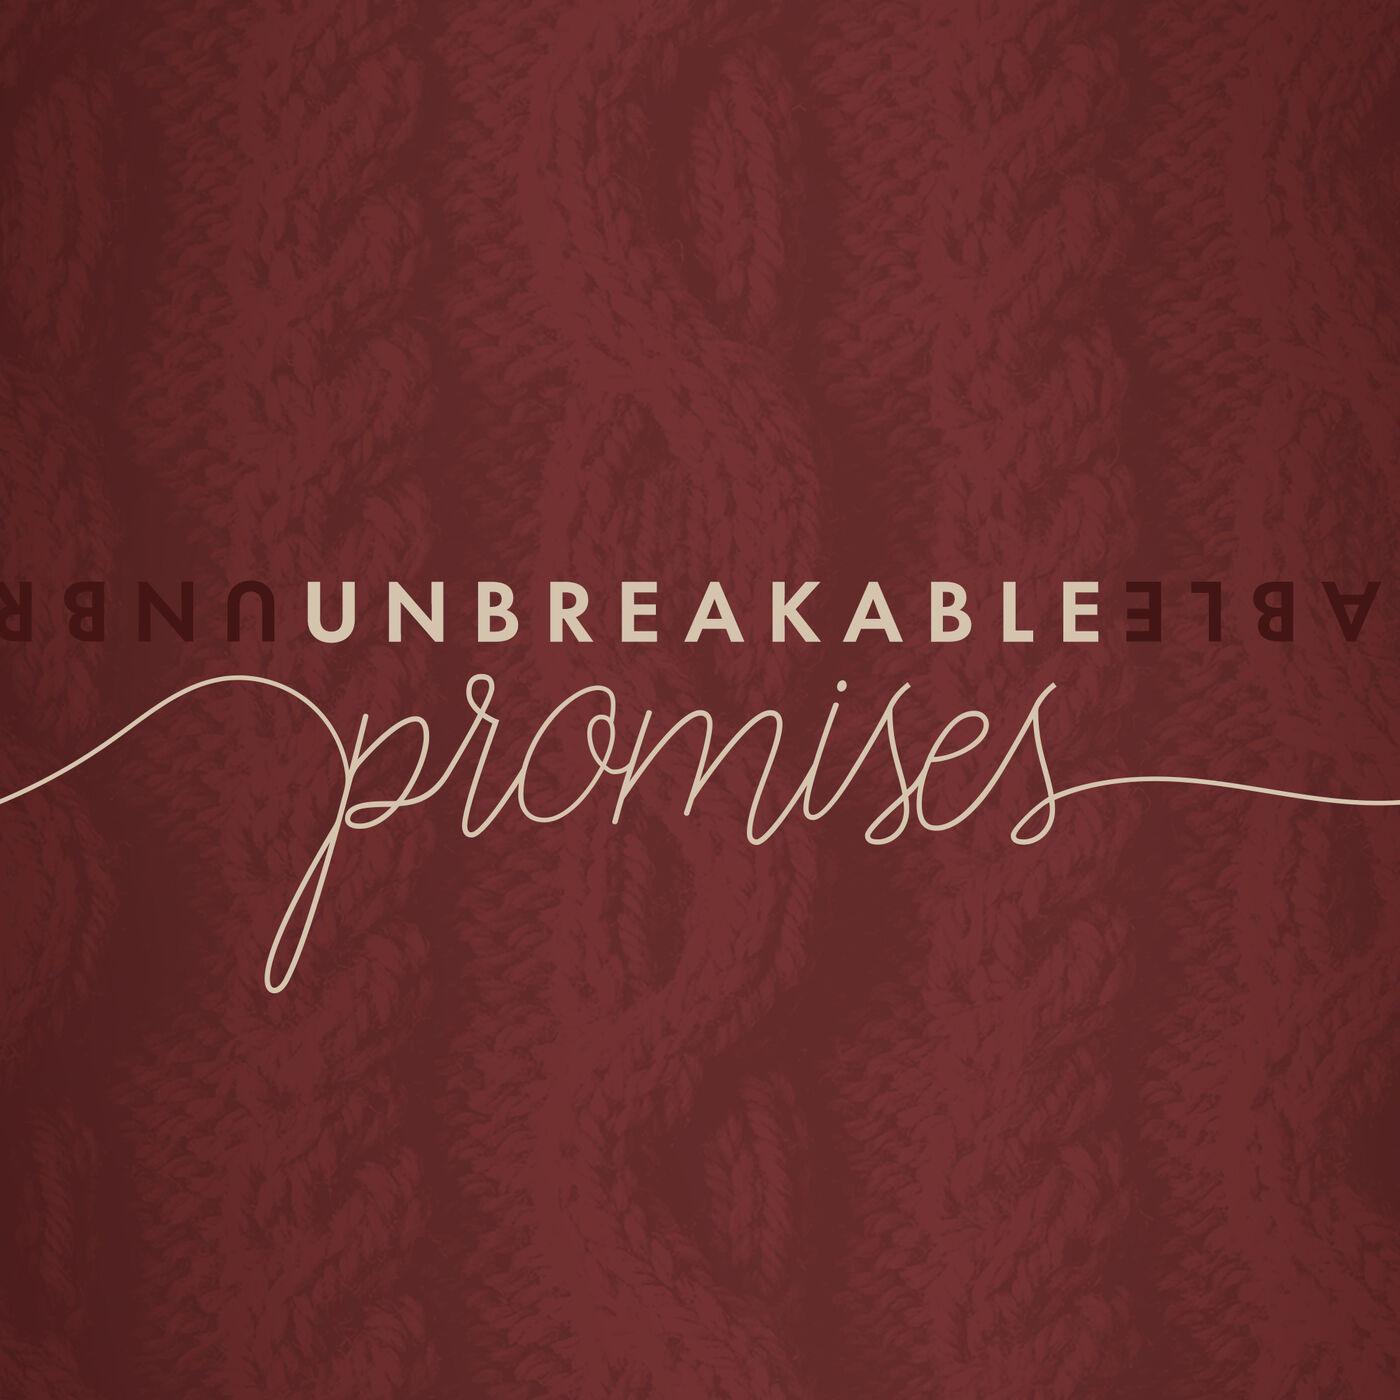 Unbreakable Promises - To Rule Forever (Week 2)